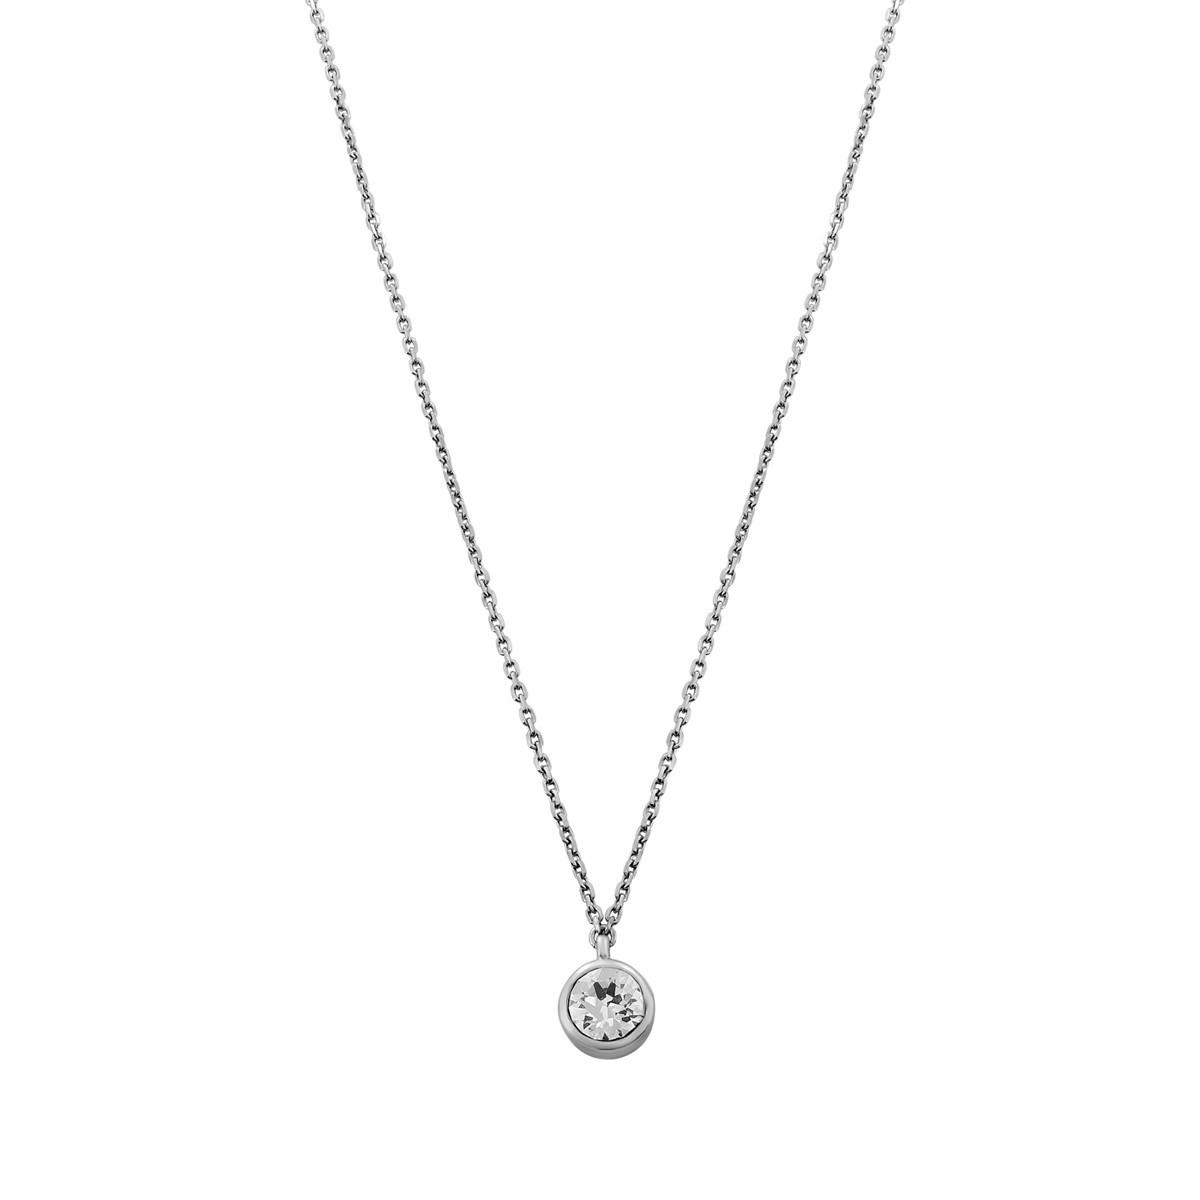 collier ras de cou argent zirconium